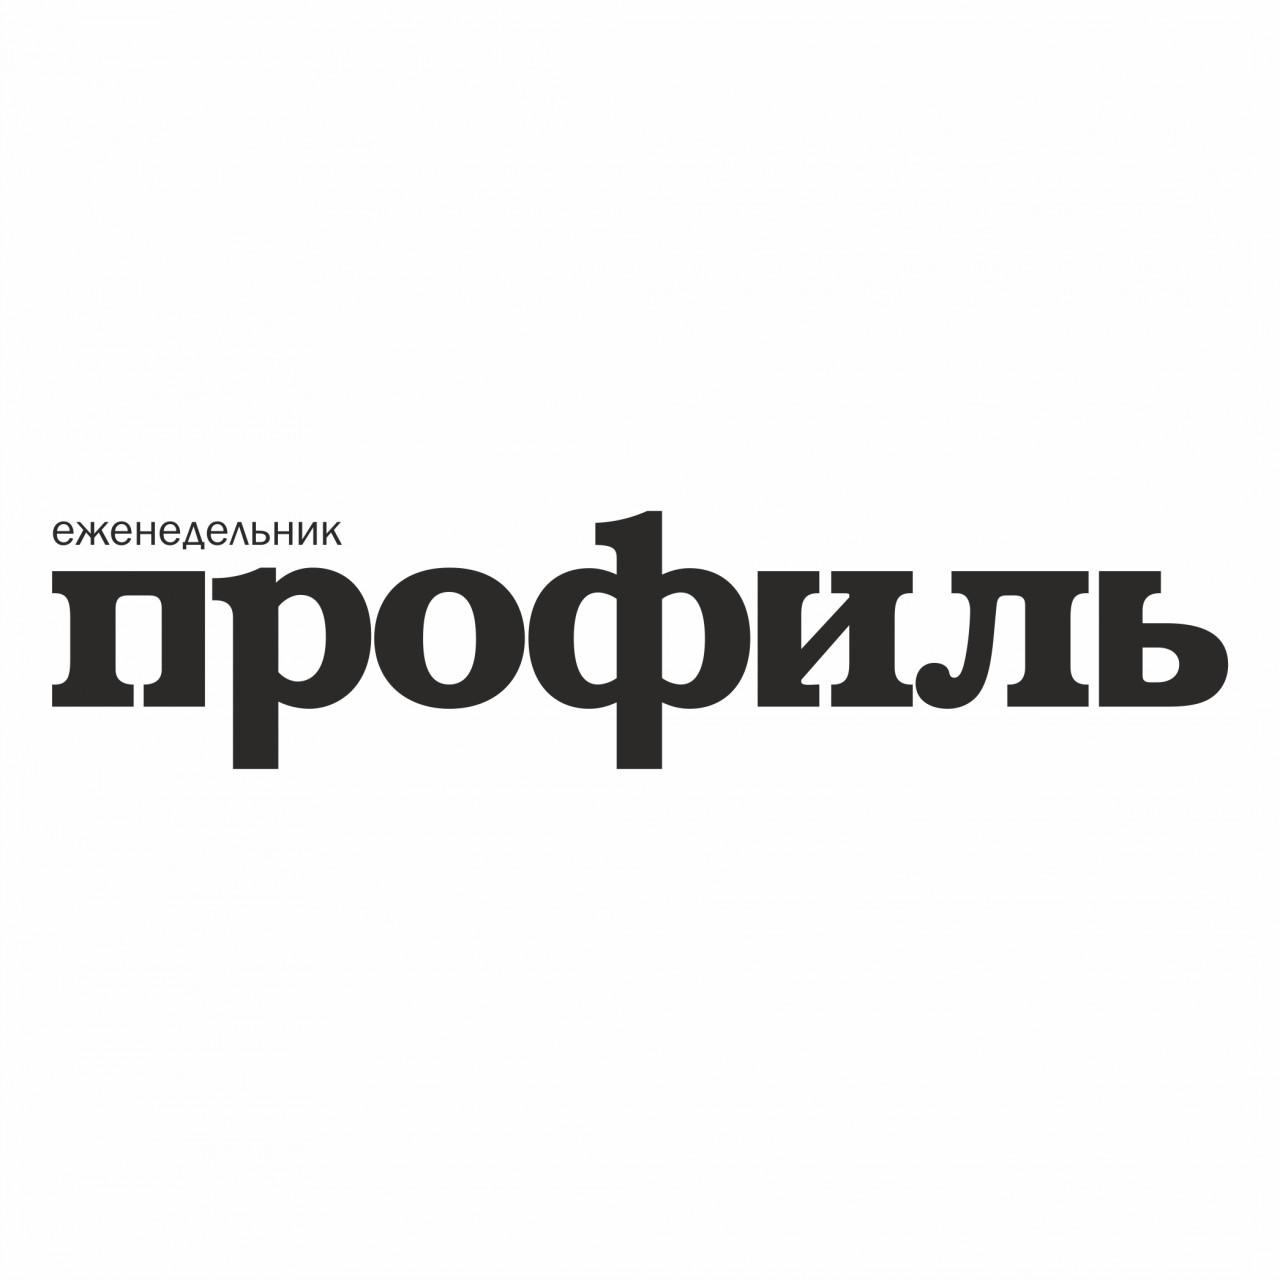 В Кремле признали наличие проблем в системе МЧС